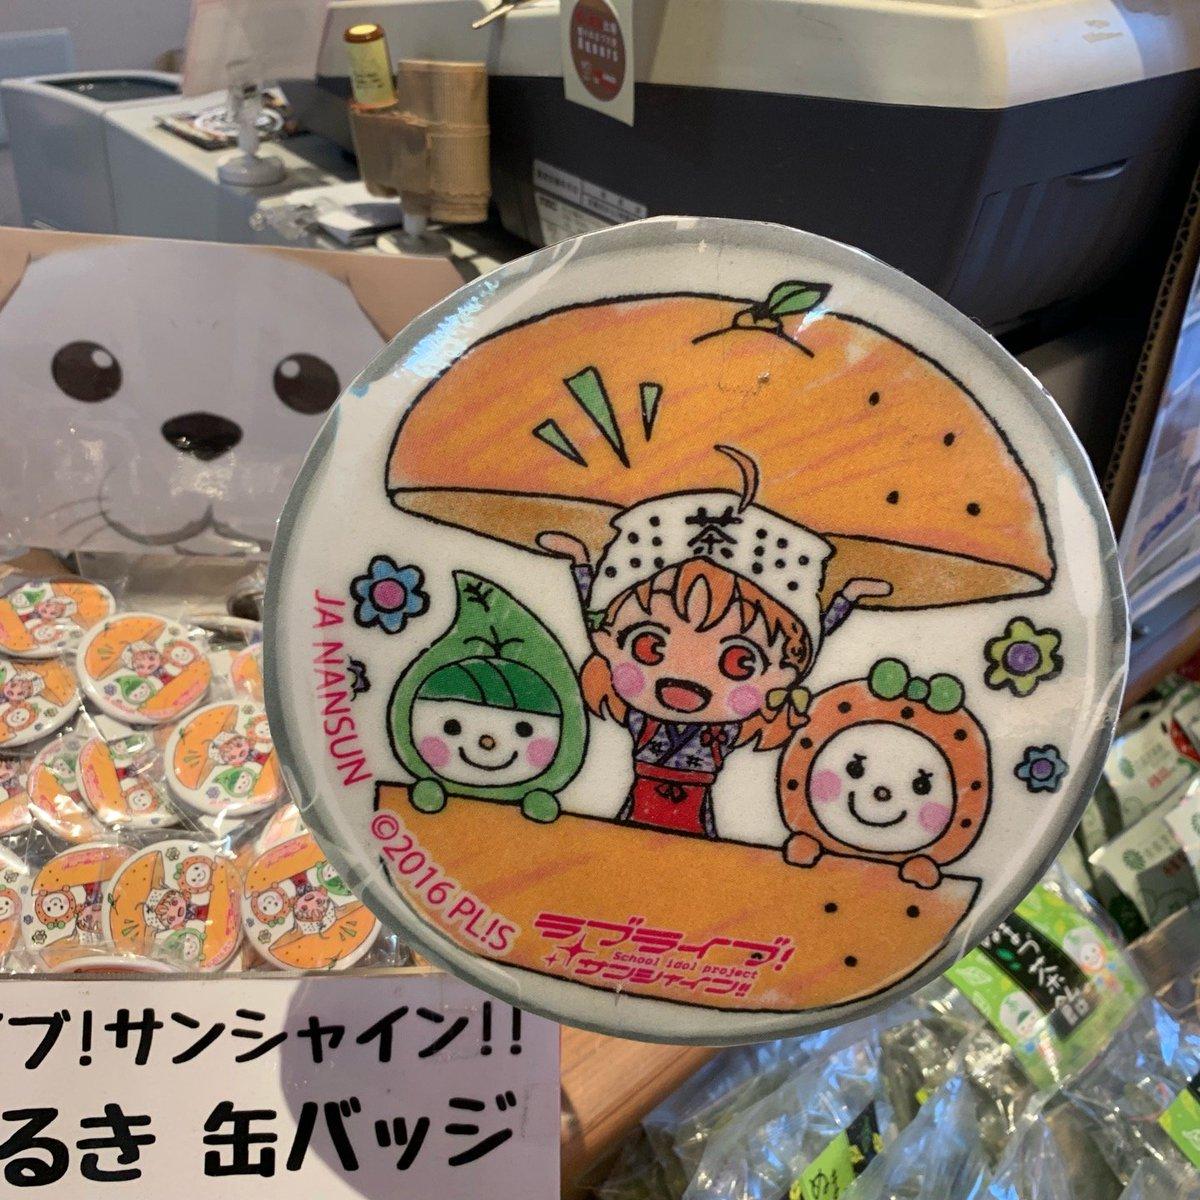 JAなんすん 沼津みなと新鮮館(沼津まちあるき缶バッジ・高海千歌)